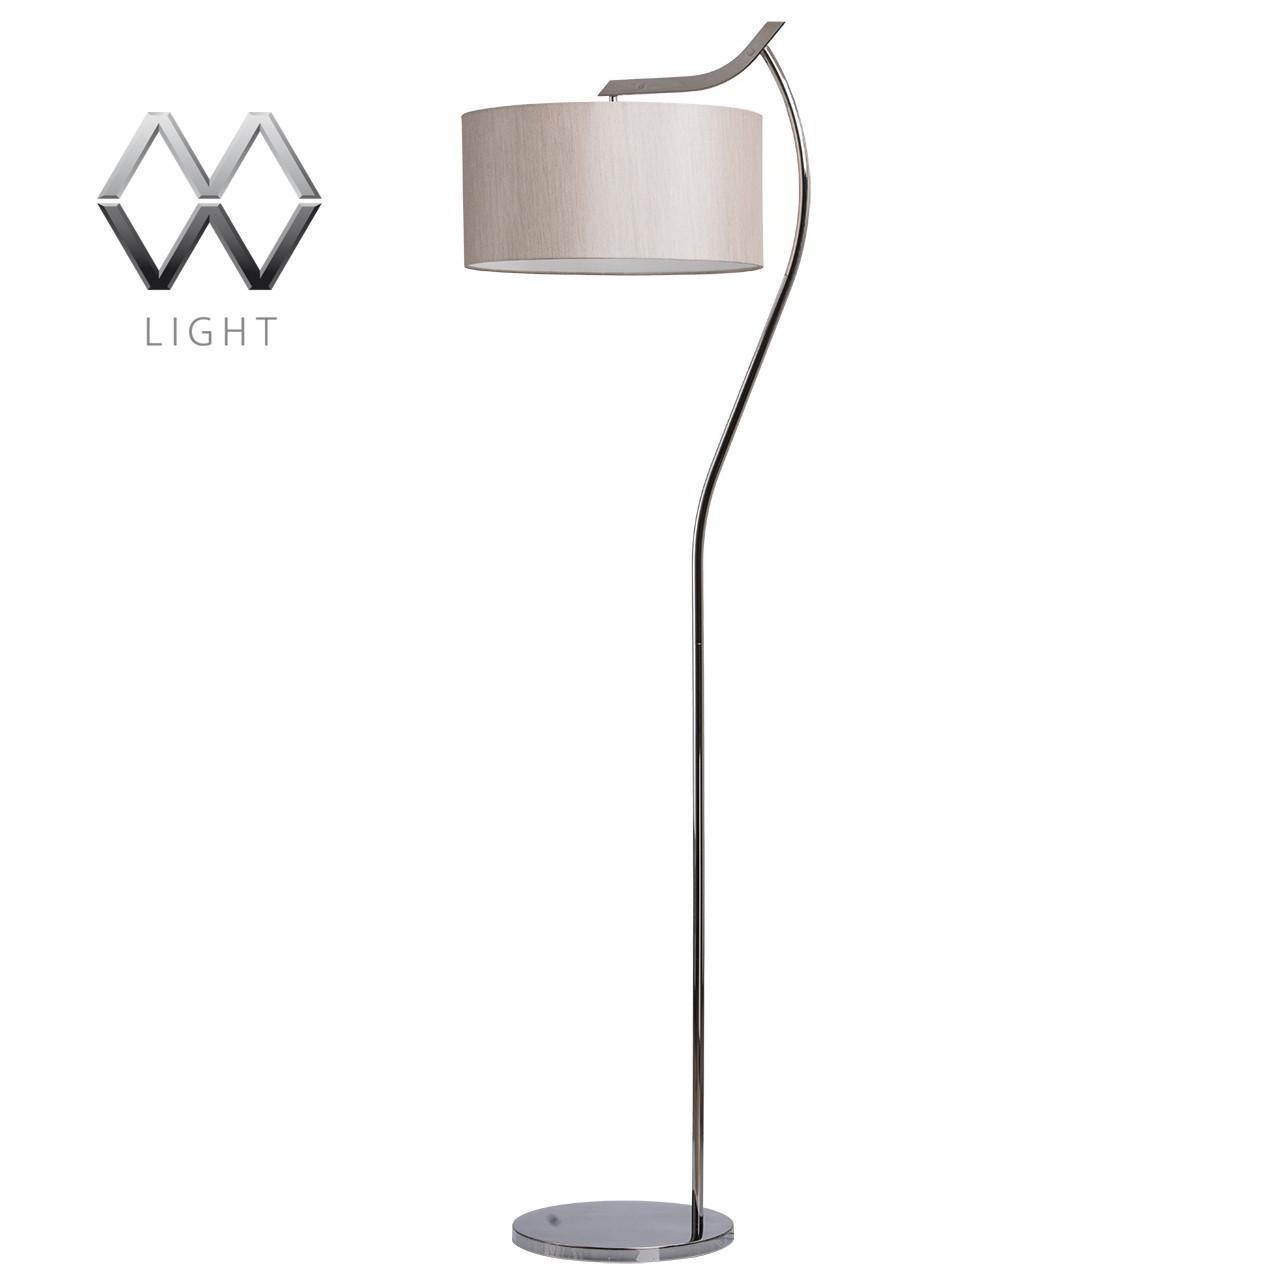 Торшер MW-Light Хилтон 626040301 mw light торшер mw light ракурс 631040701